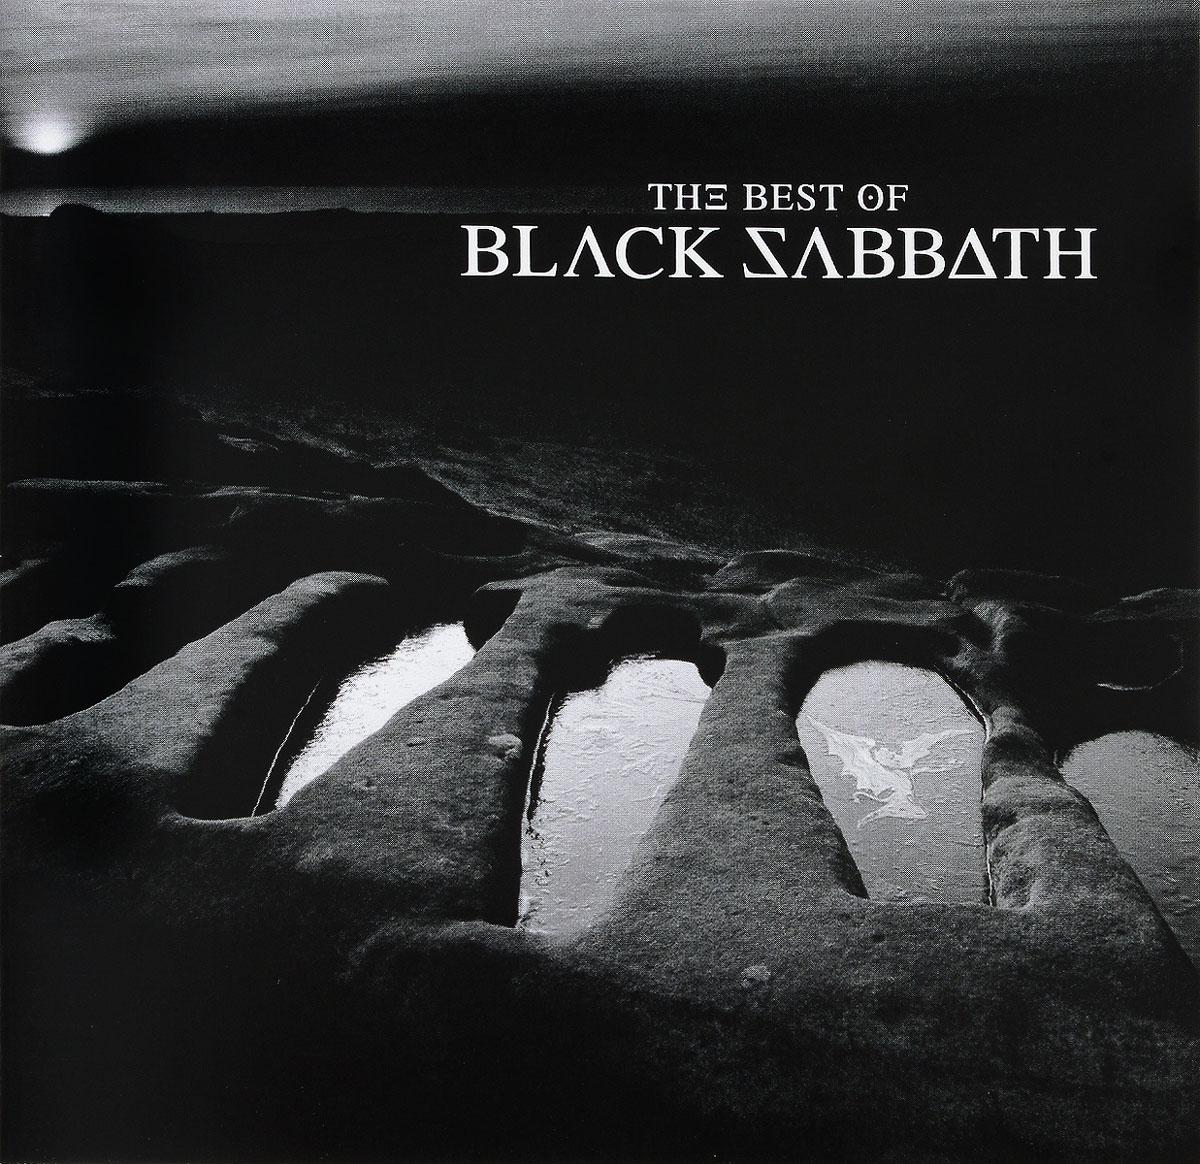 Black Sabbath Black Sabbath. The Best Of Black Sabbath (2 CD) black sabbath the end blu ray cd